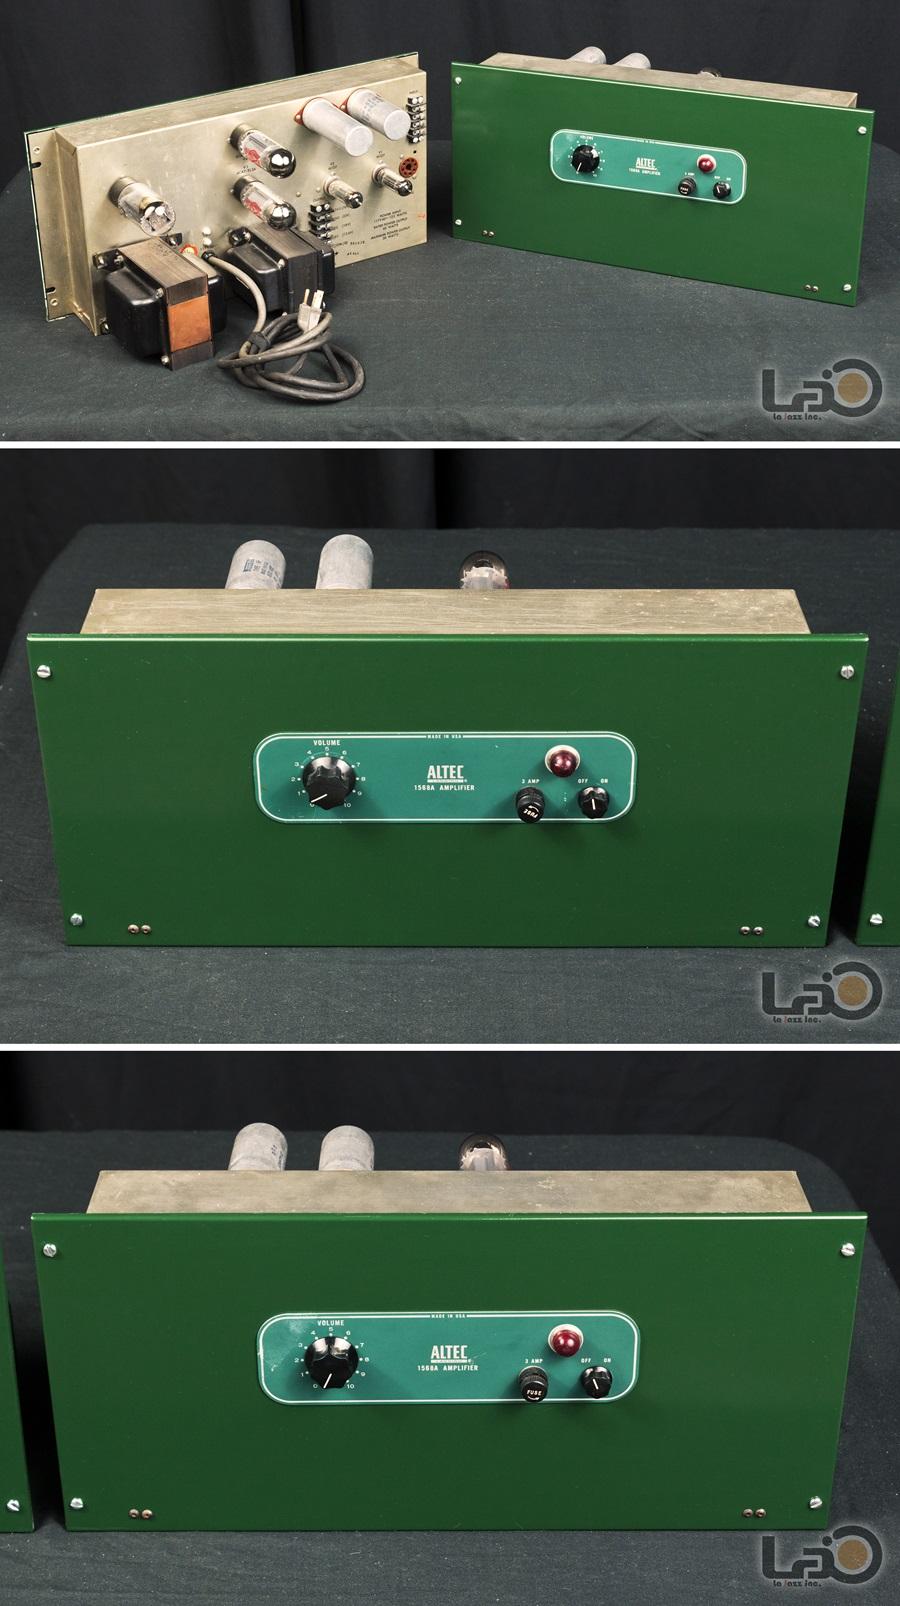 ALTEC 1568A Amplifier ◆ 真空管パワー・アンプ (専用キャビネット付き) ◆6